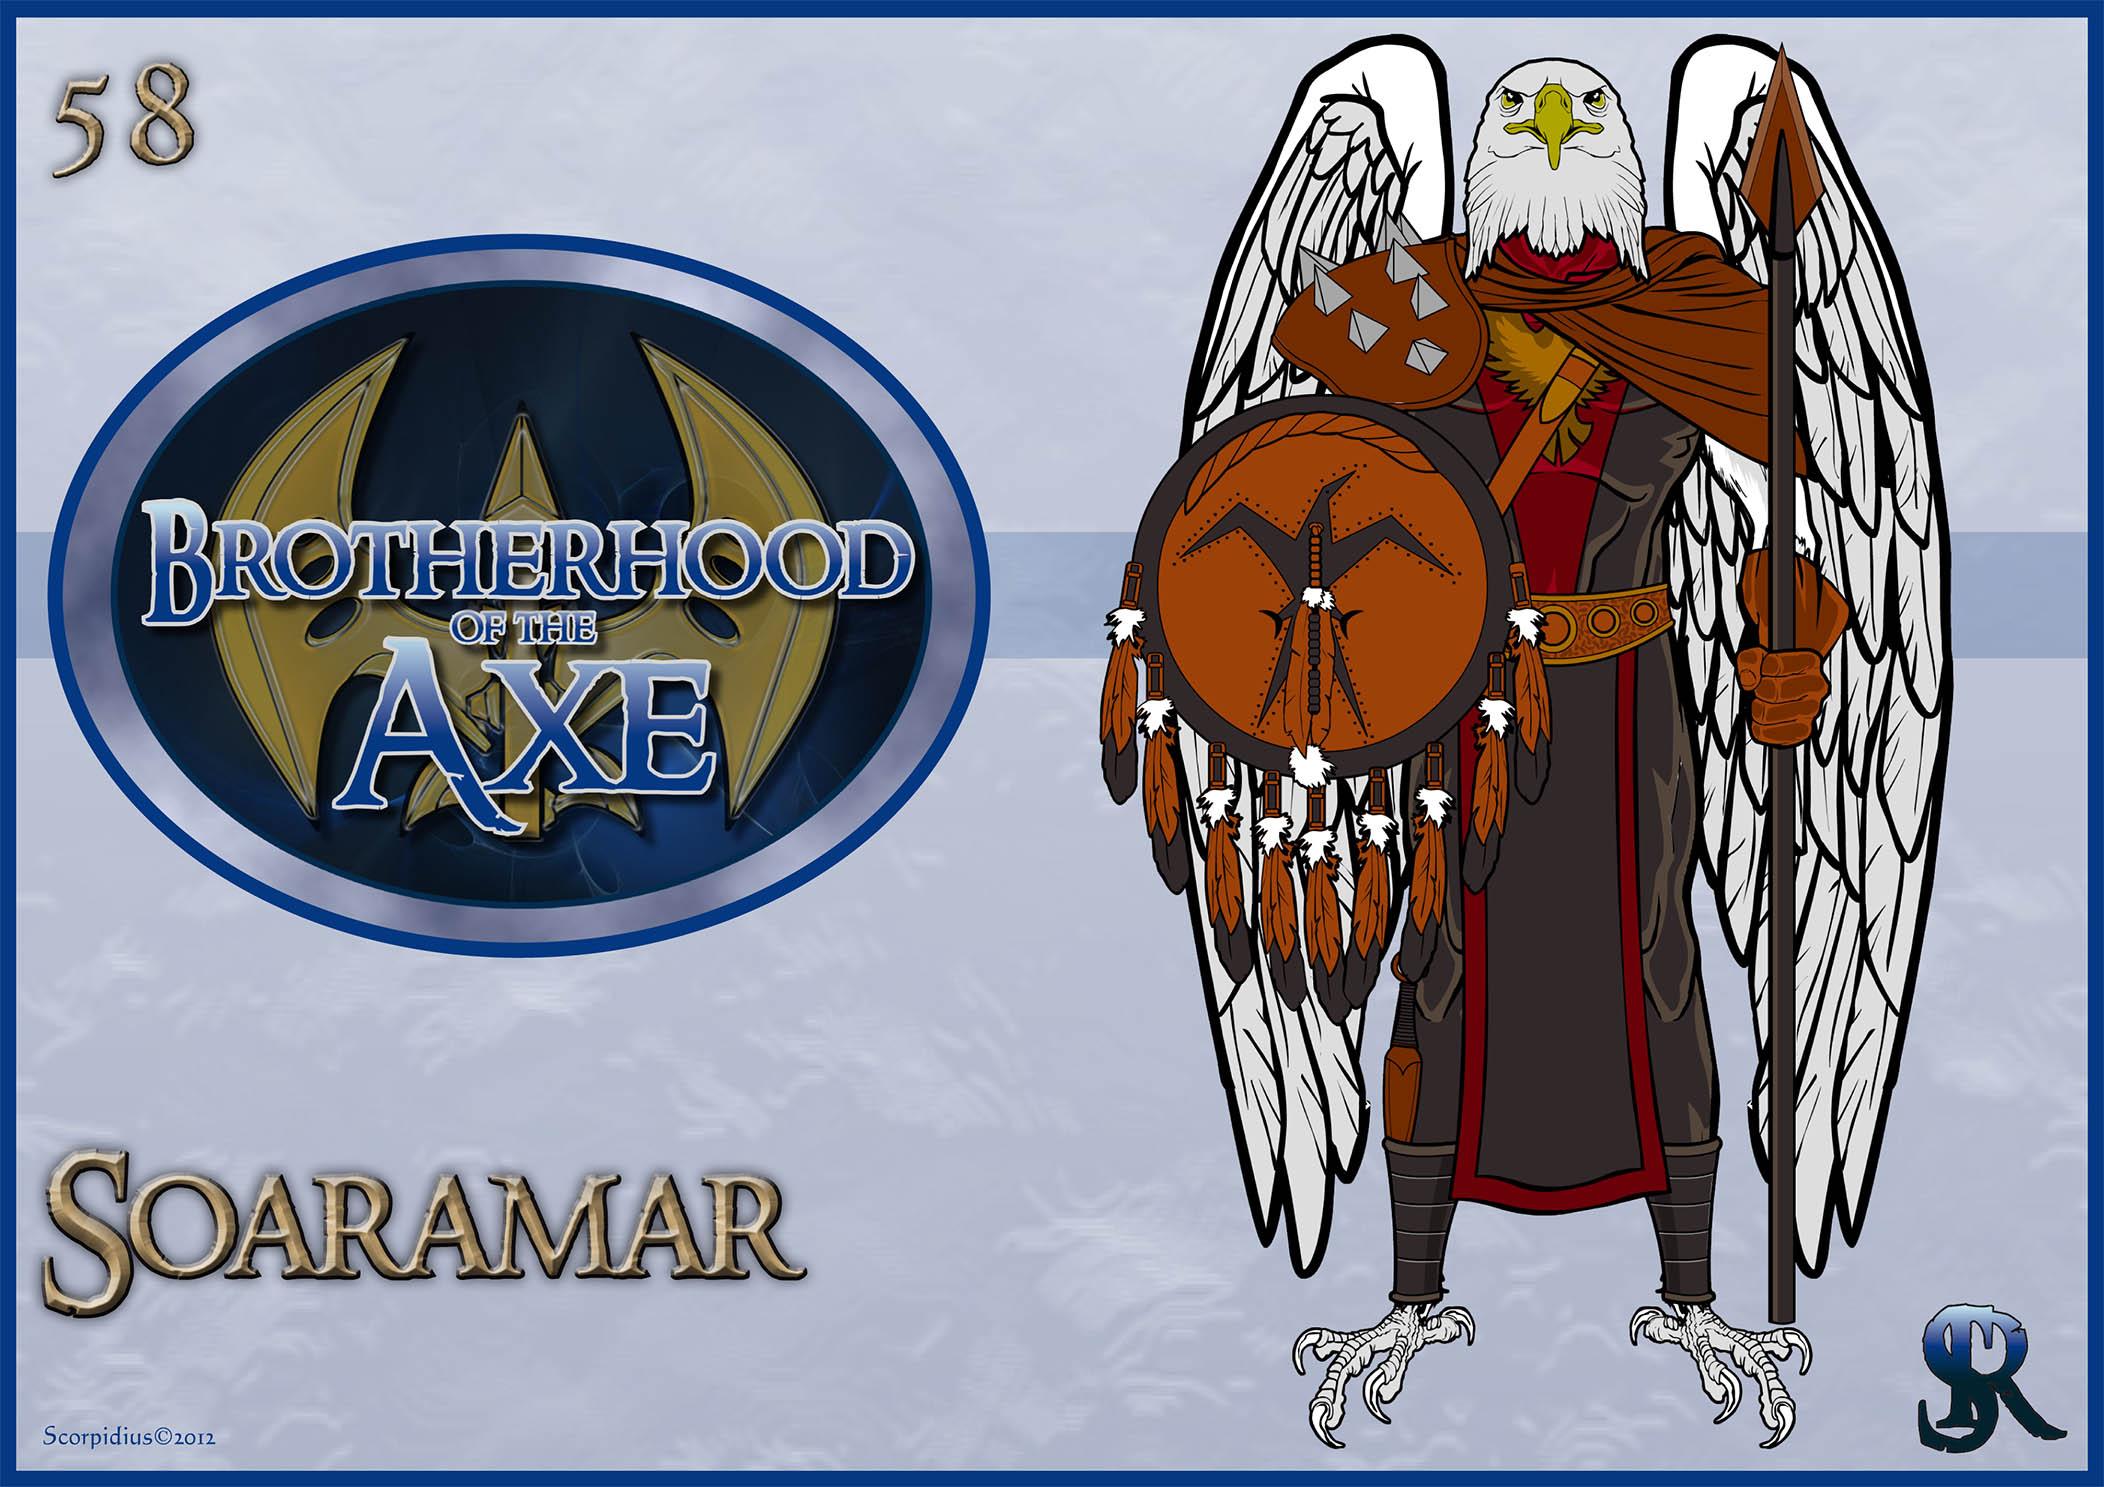 http://www.heromachine.com/wp-content/legacy/forum-image-uploads/scorpidius/2012/03/058-Soaramar.jpg